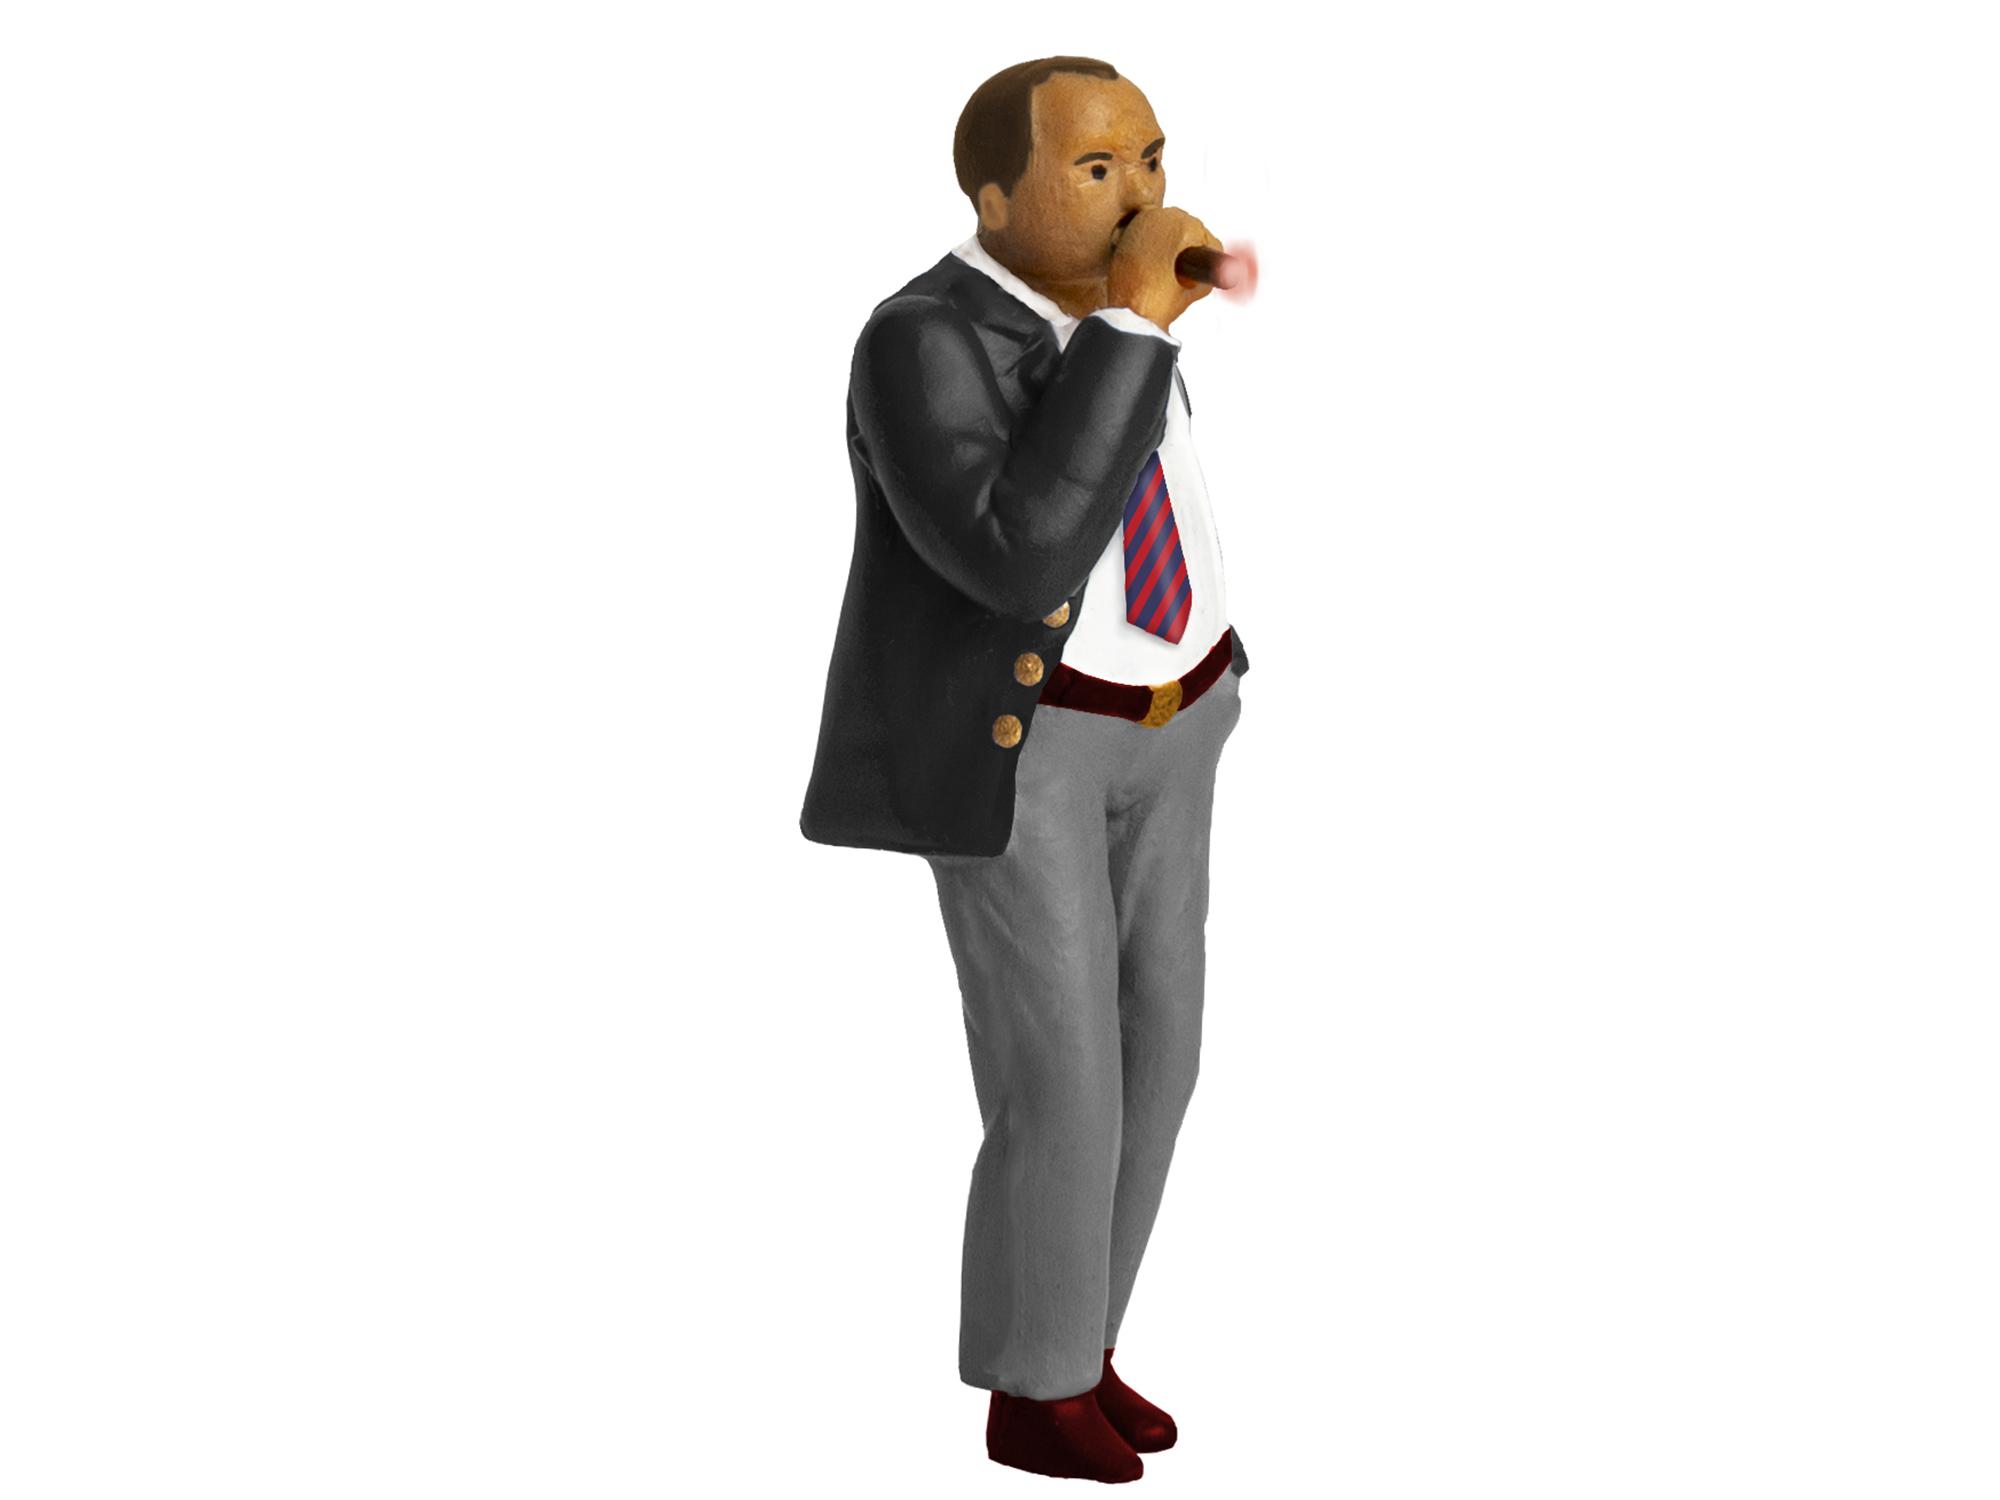 Lionel 1930320 O Smoking Tony Lighted Figure 434-1930320